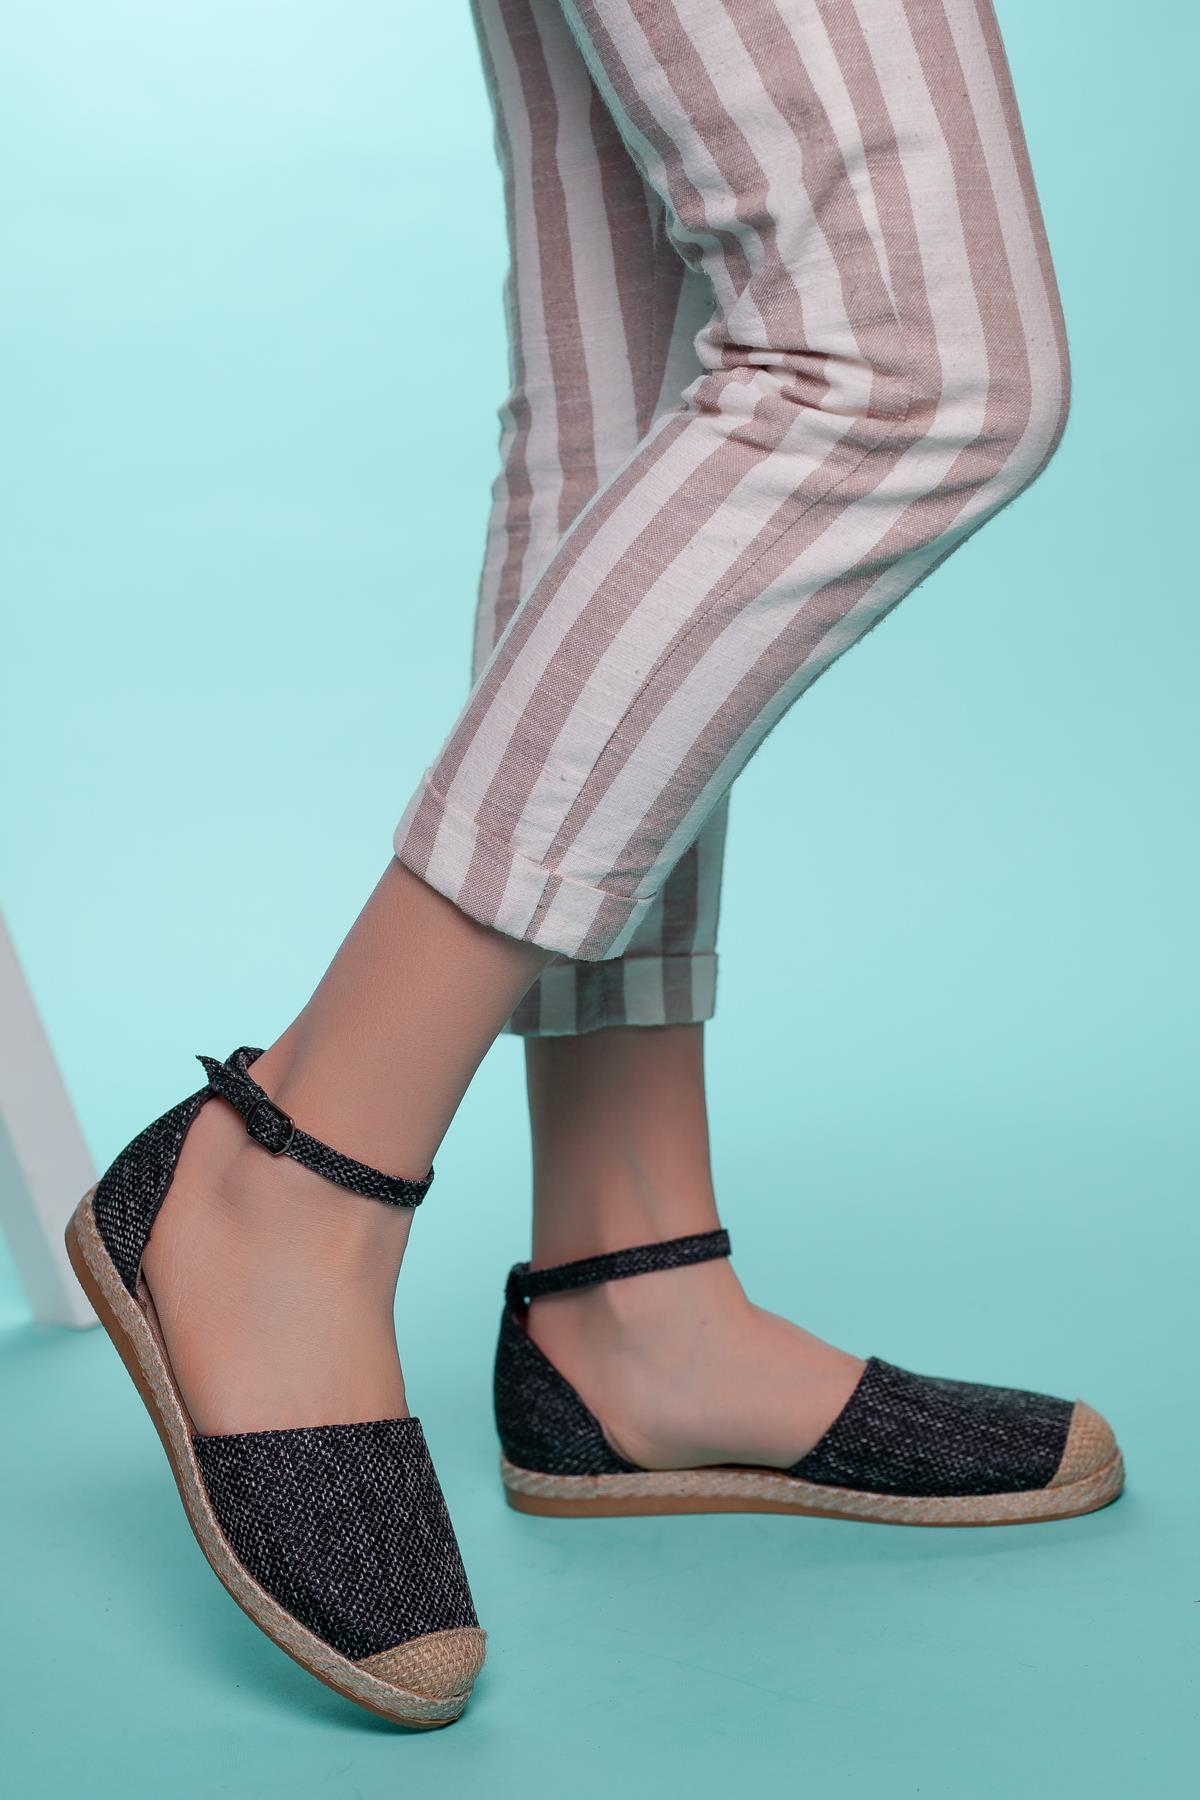 Women's Ankle Strap Espadrille Shoes